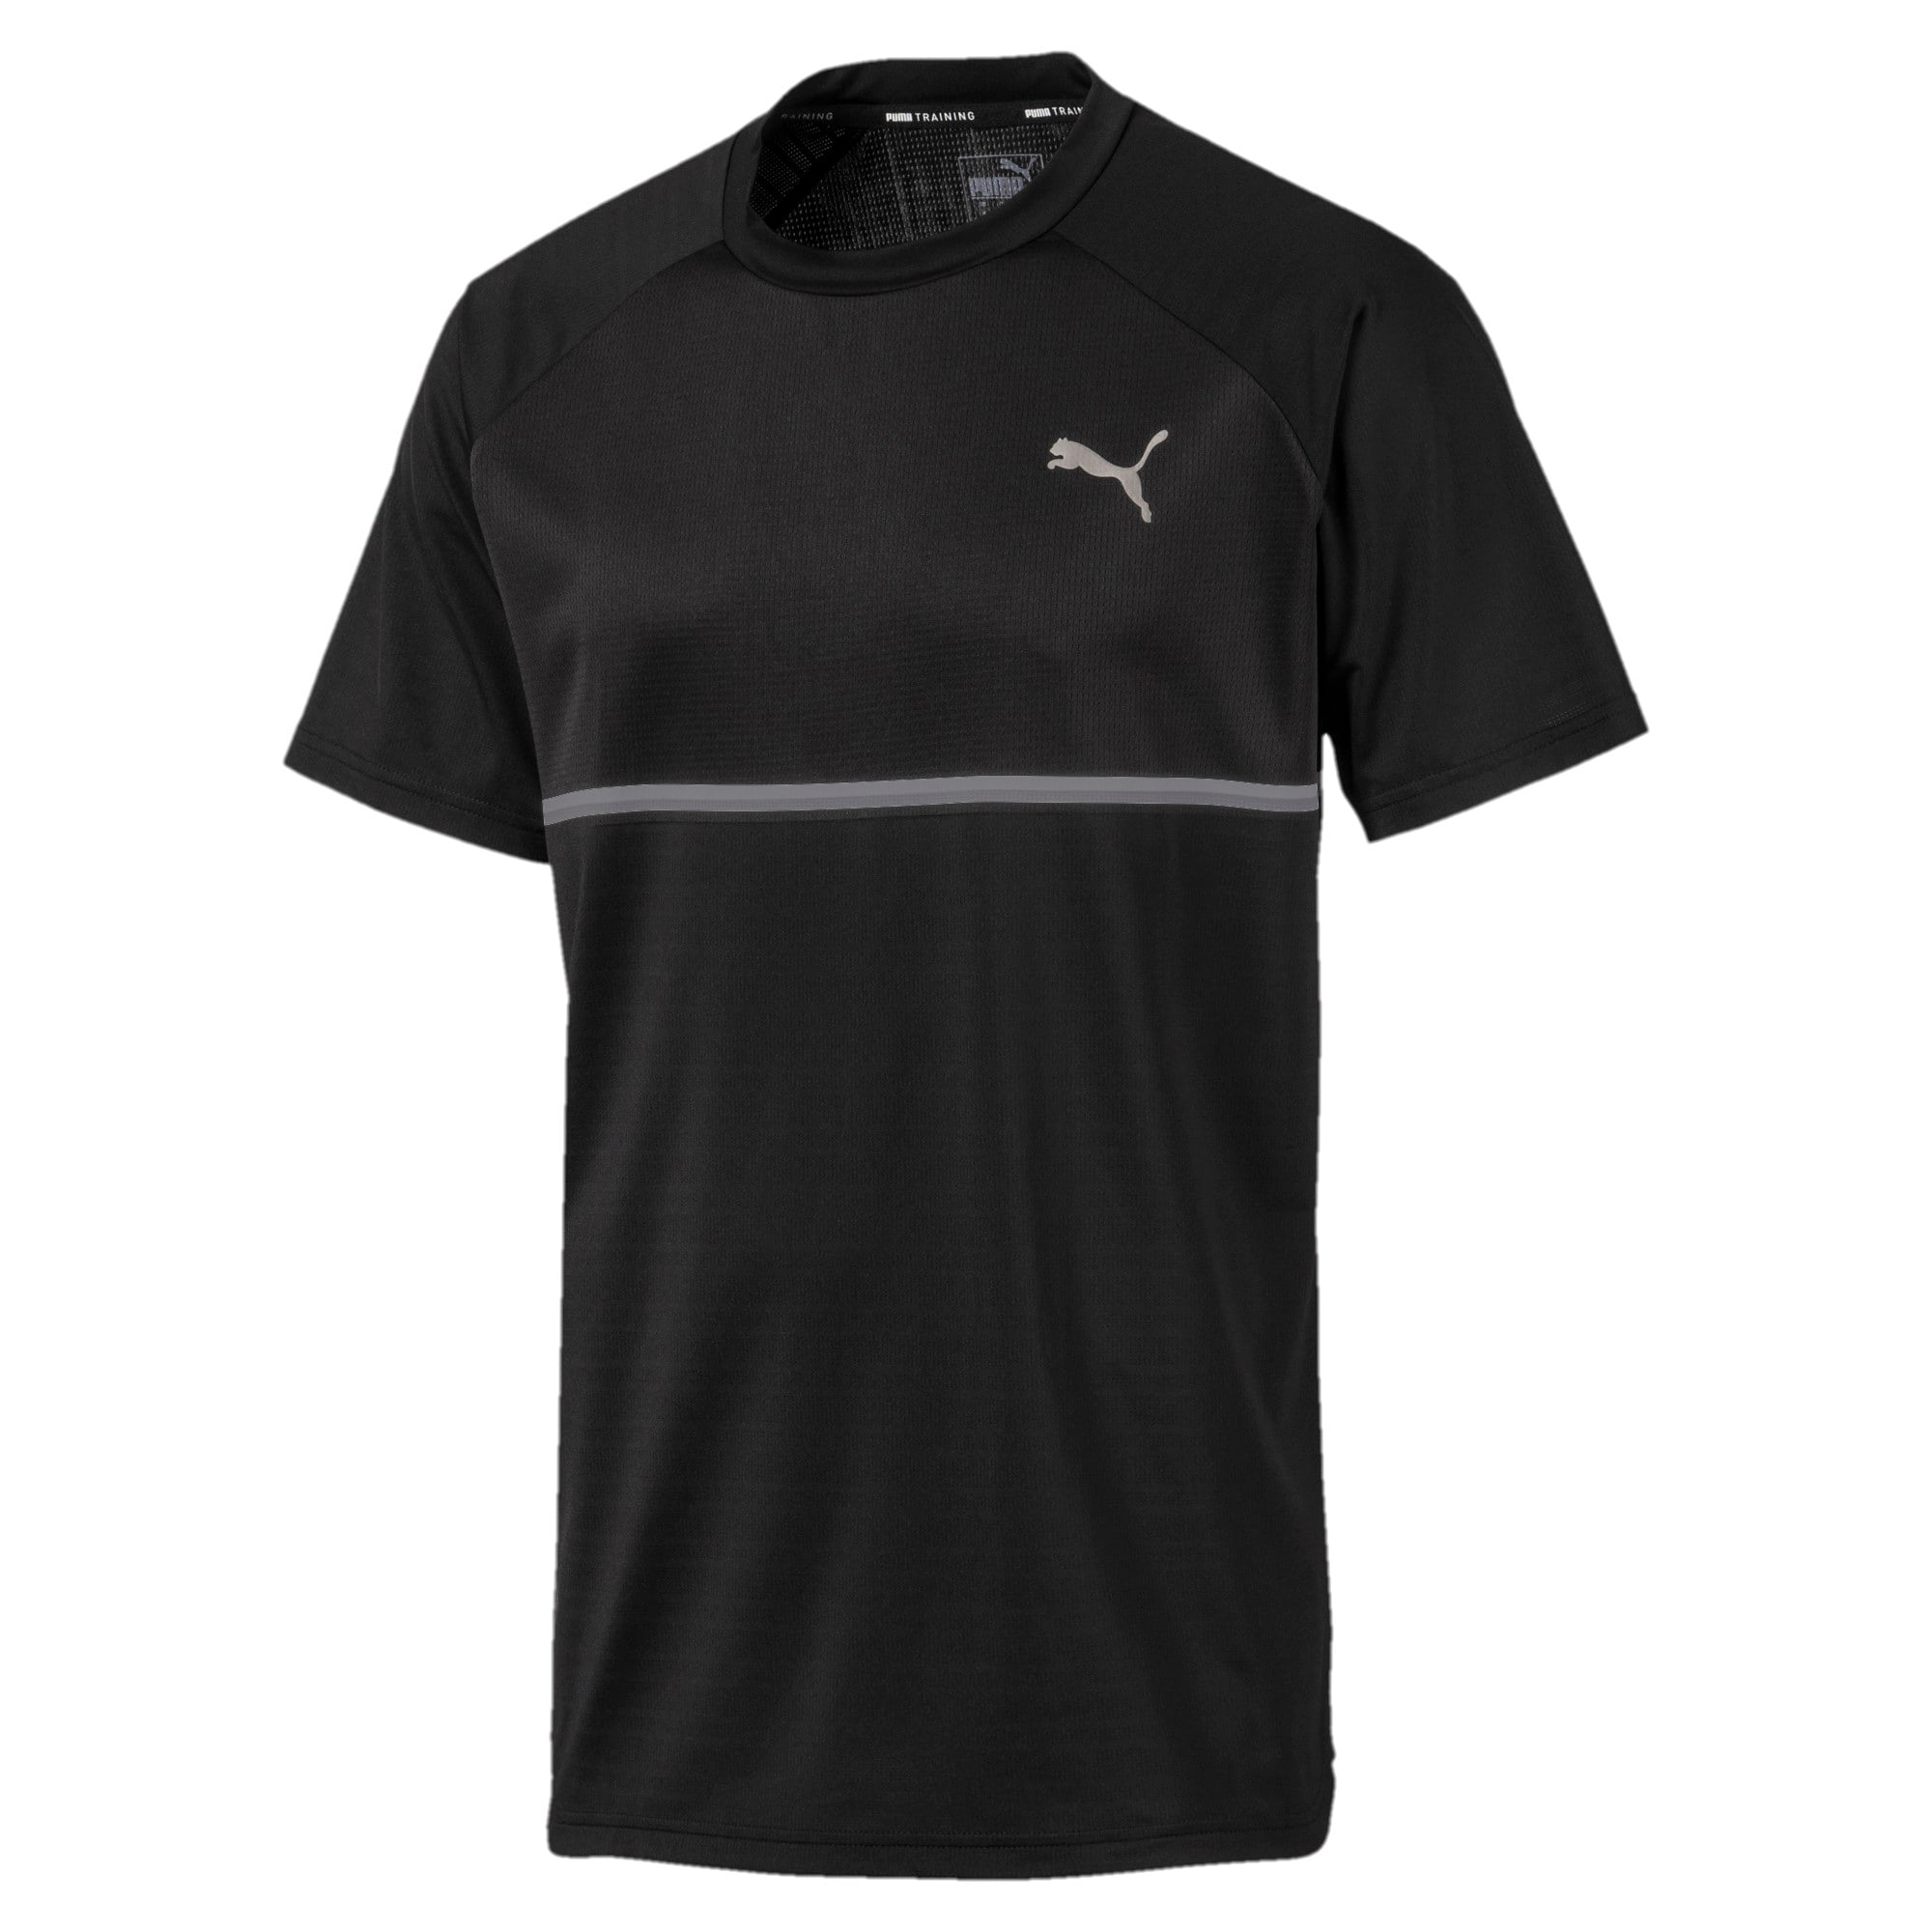 Thumbnail 4 of Power BND T-shirt voor heren, Puma Black, medium